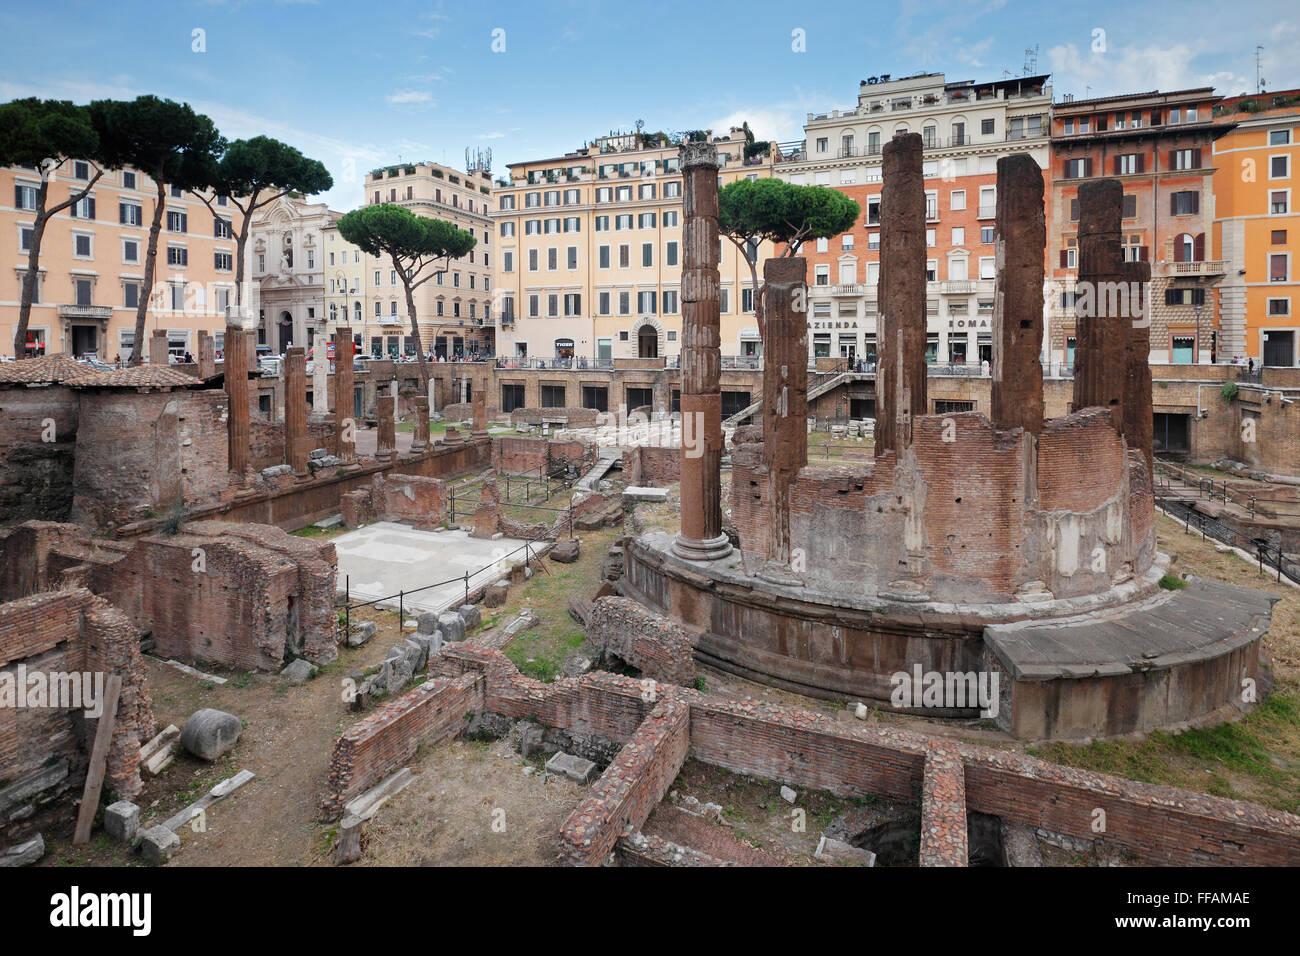 Largo di Torre Argentina in Rome, Italy - Stock Image